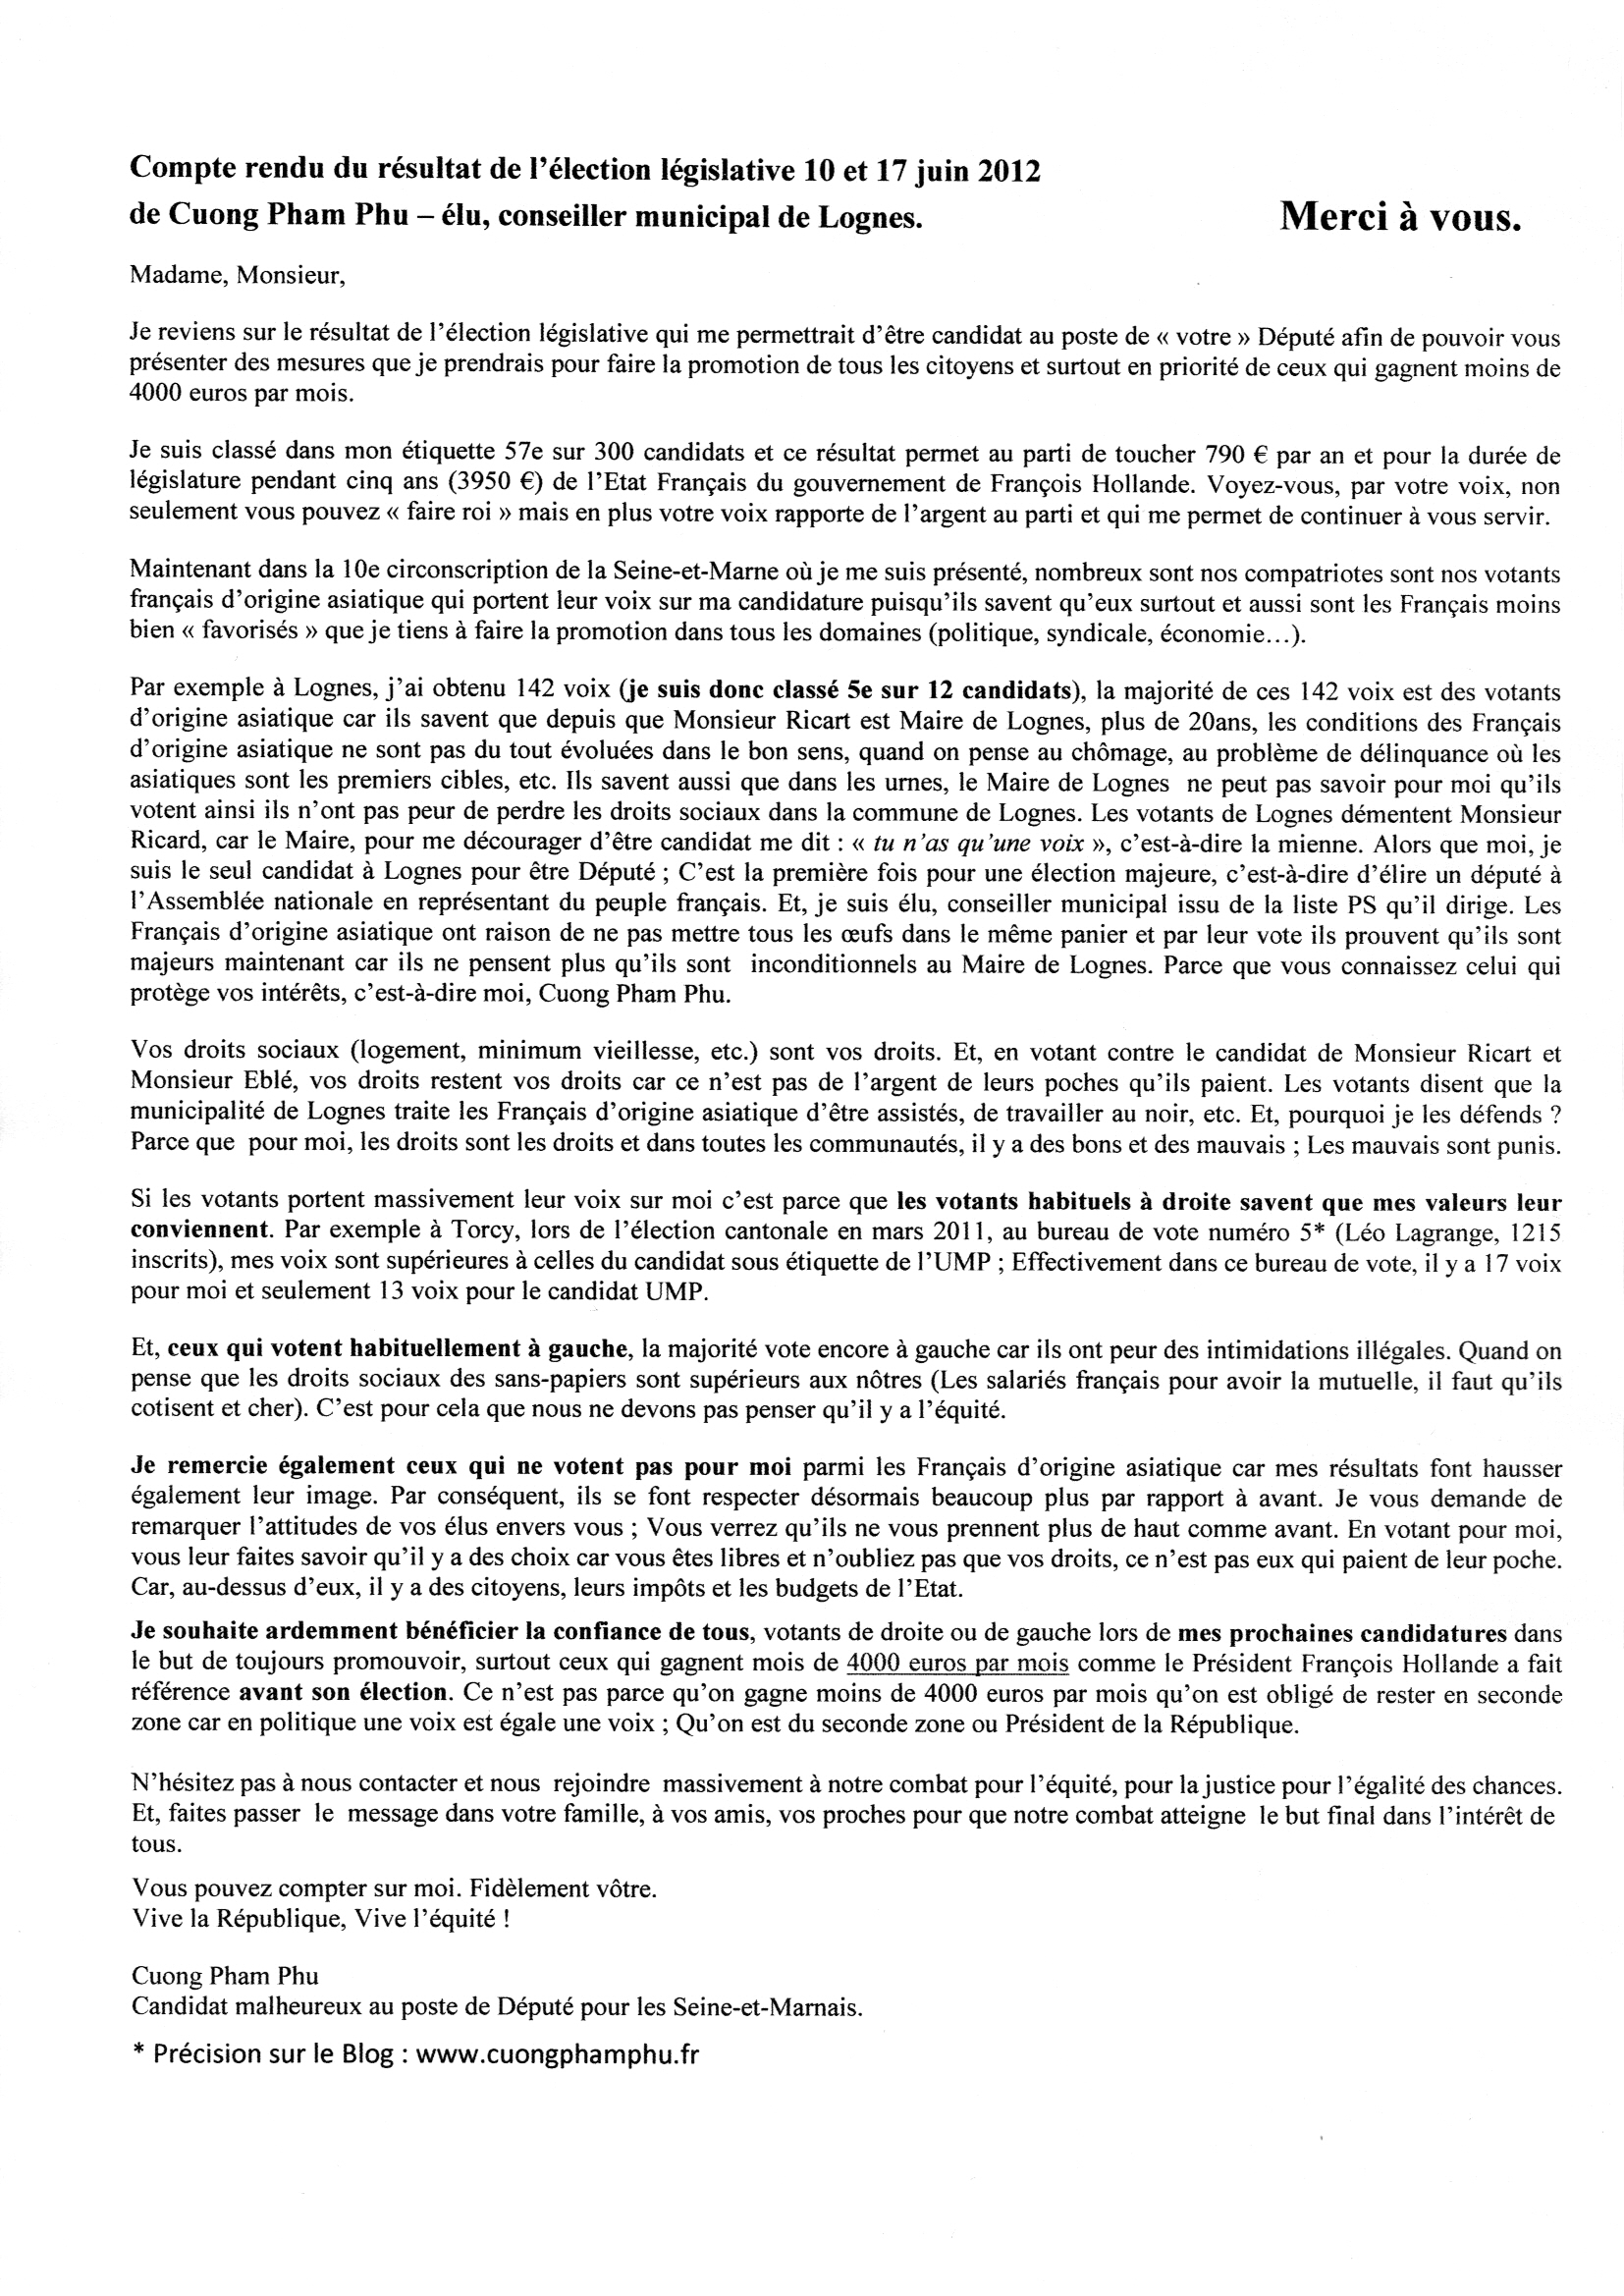 compte-rendu-lelection-legislative.JPG